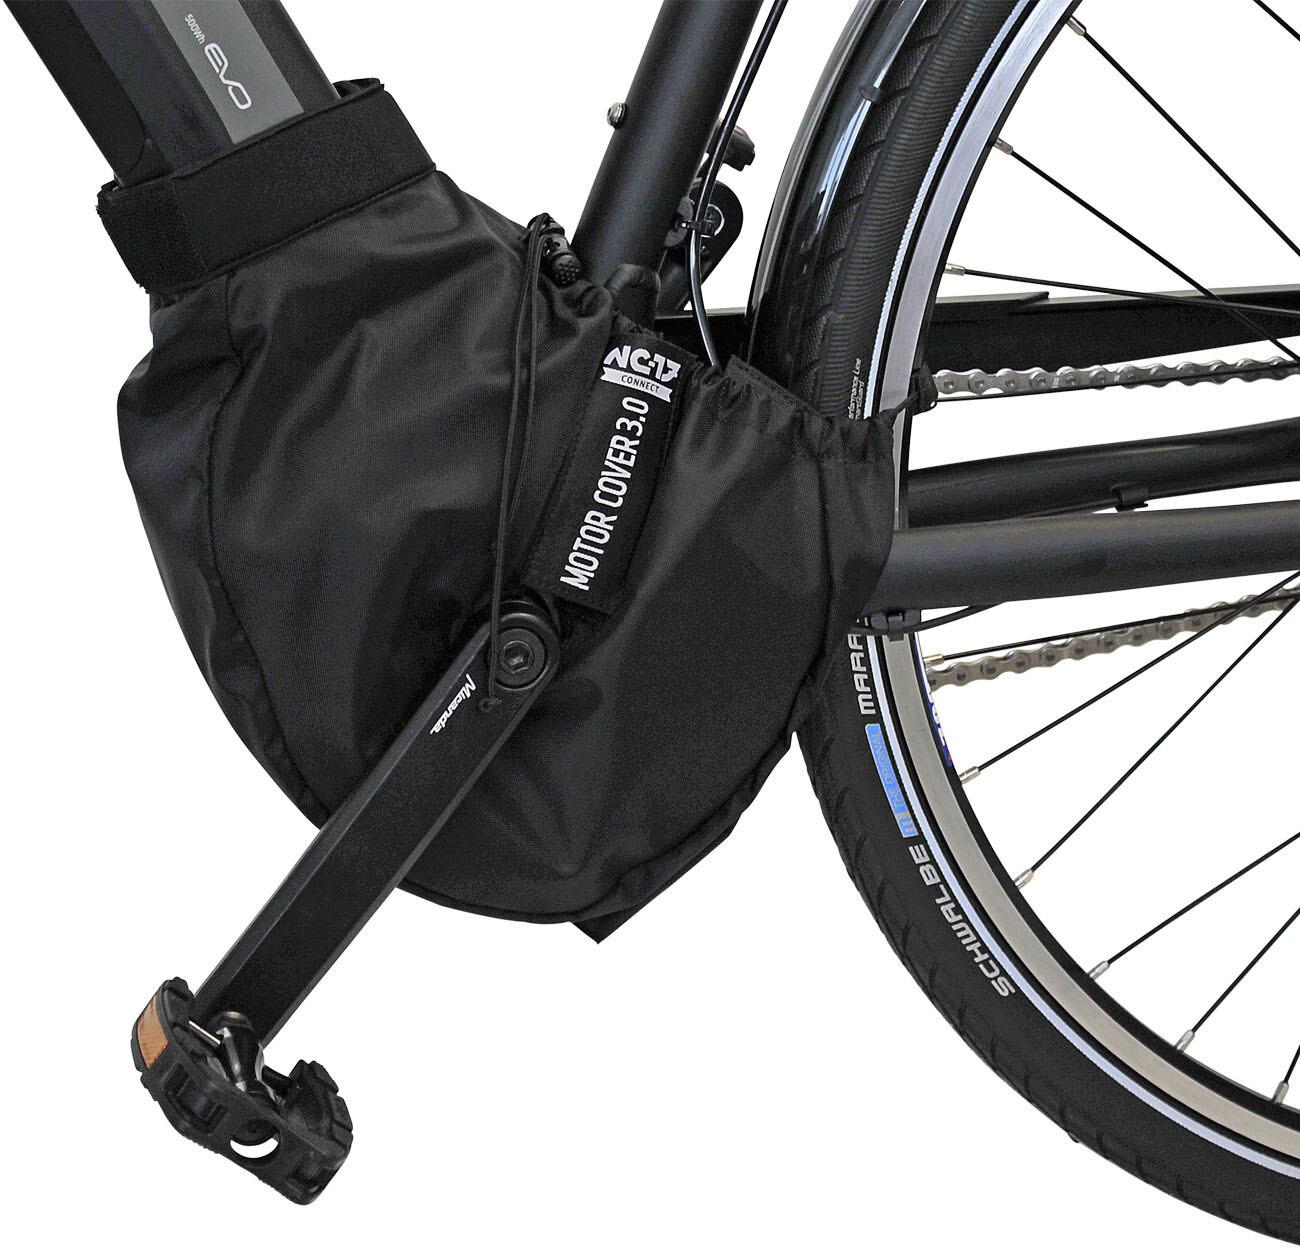 NC-17 Connect E-Bike Akku Schutzhülle Standard für Akku im Unterrohr B